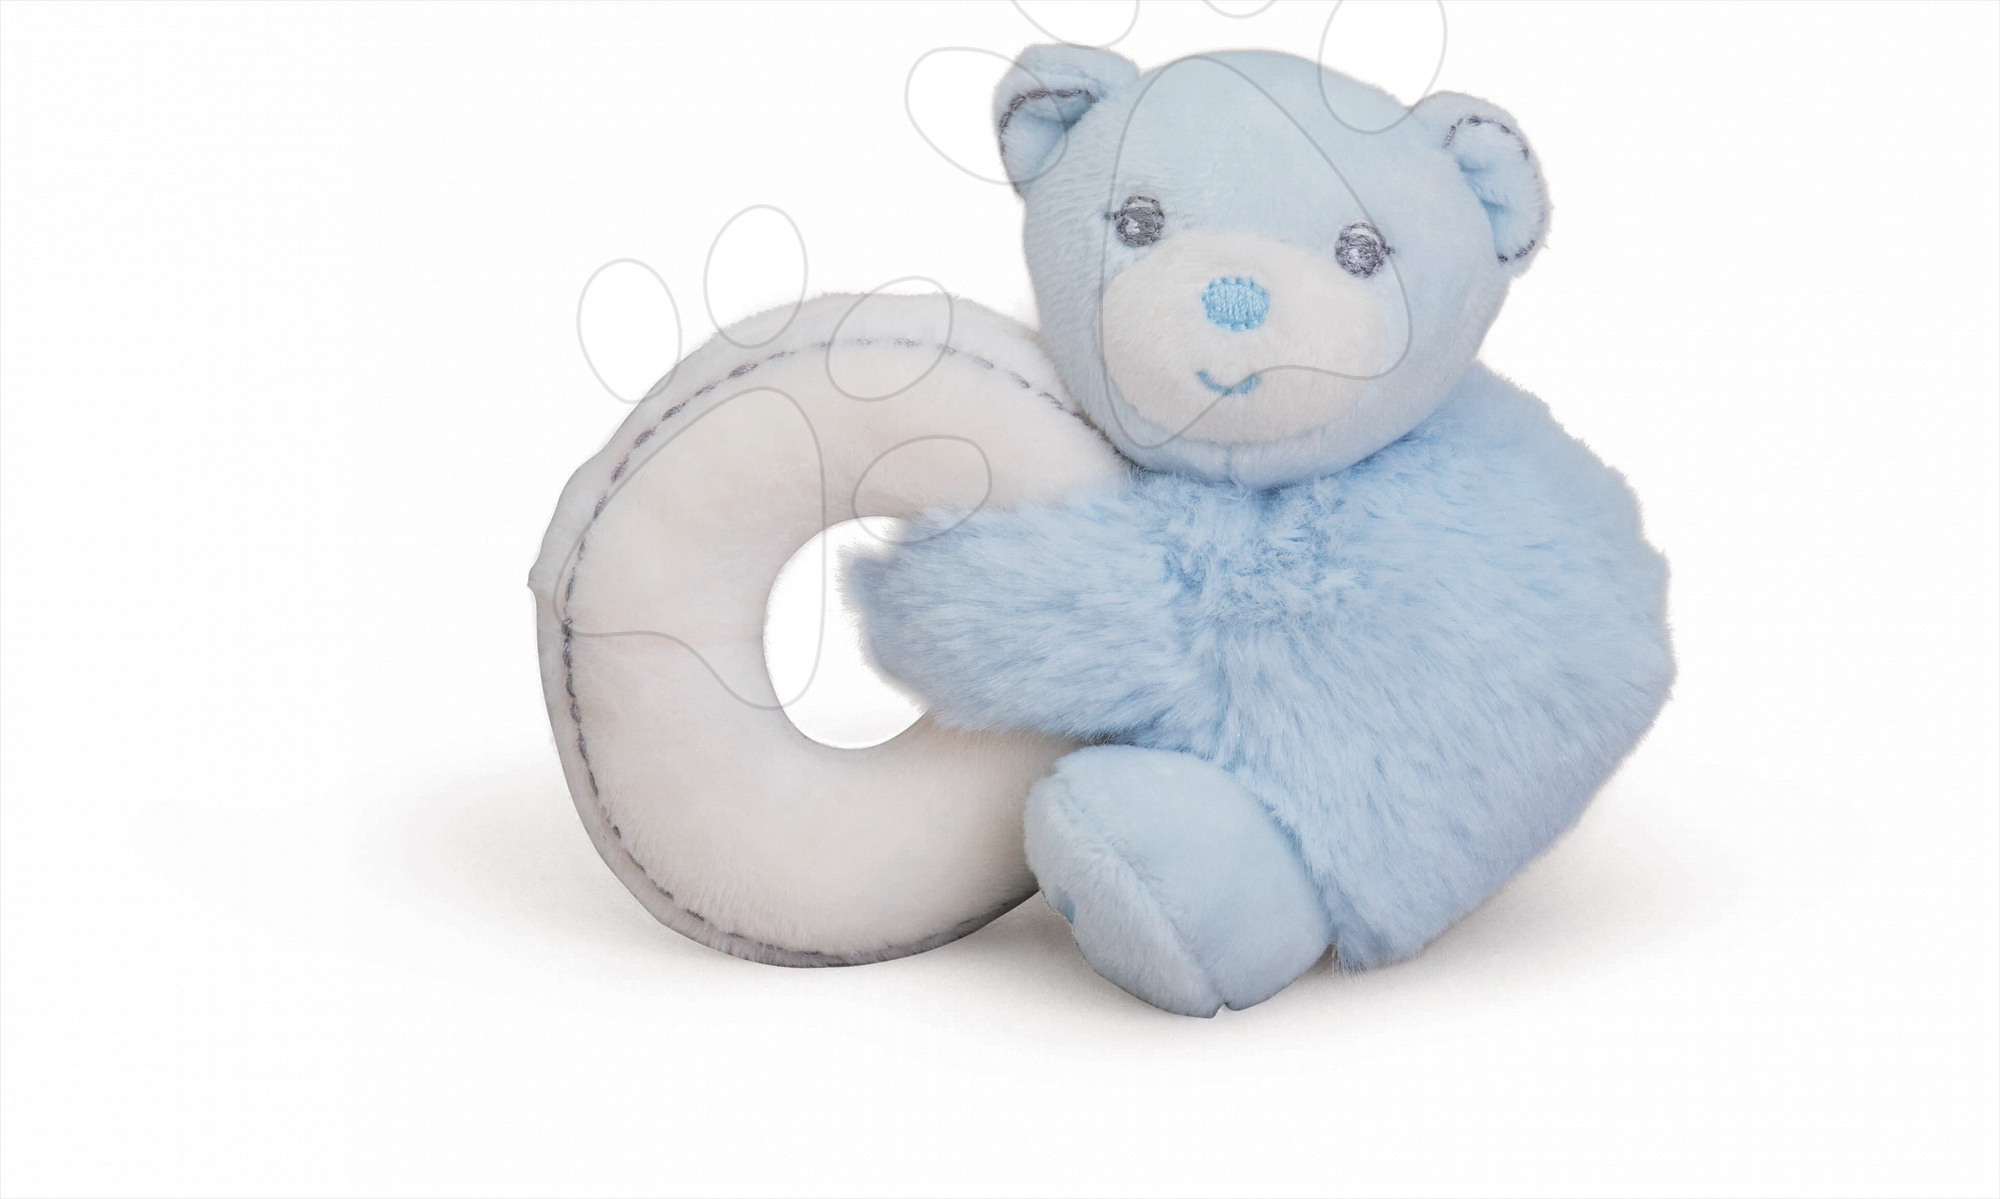 Hrkálky a hryzátka - Plyšový medvedík Perle-Mini Ratles Kaloo s hrkálkou 10 cm pre najmenších modrý